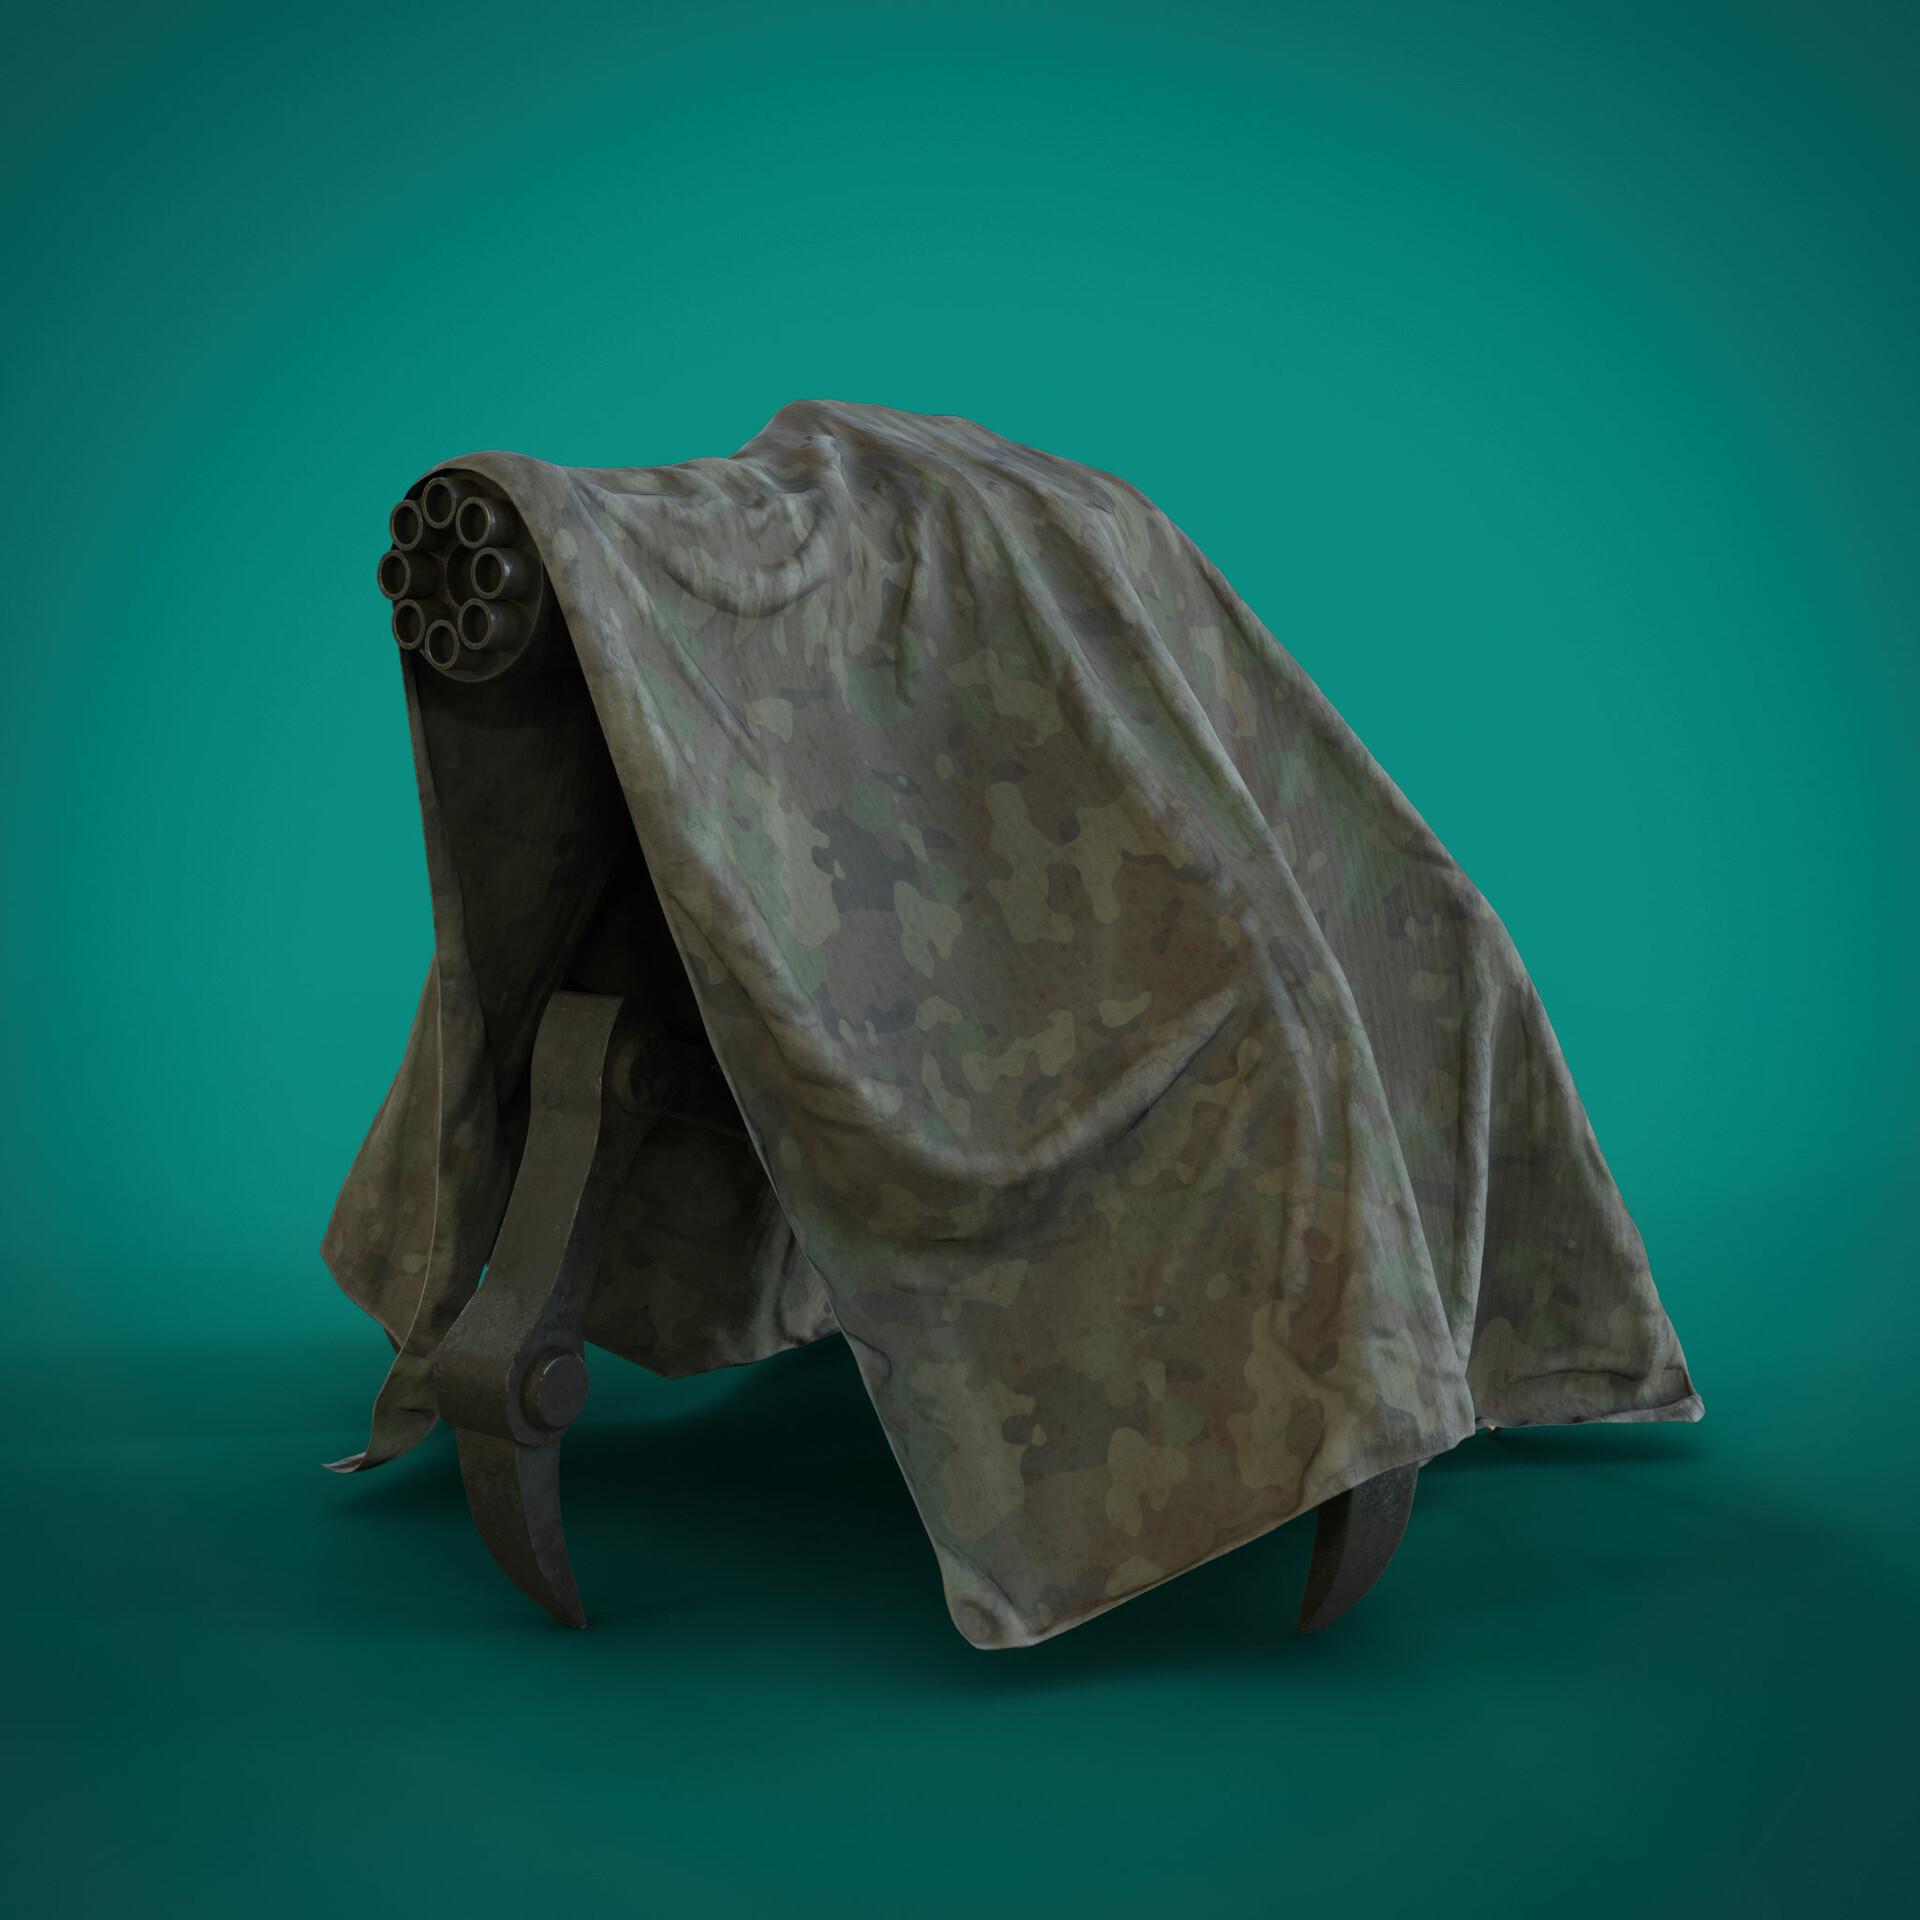 Chaingun mech - Buy Royalty Free 3D model by Hamidreza